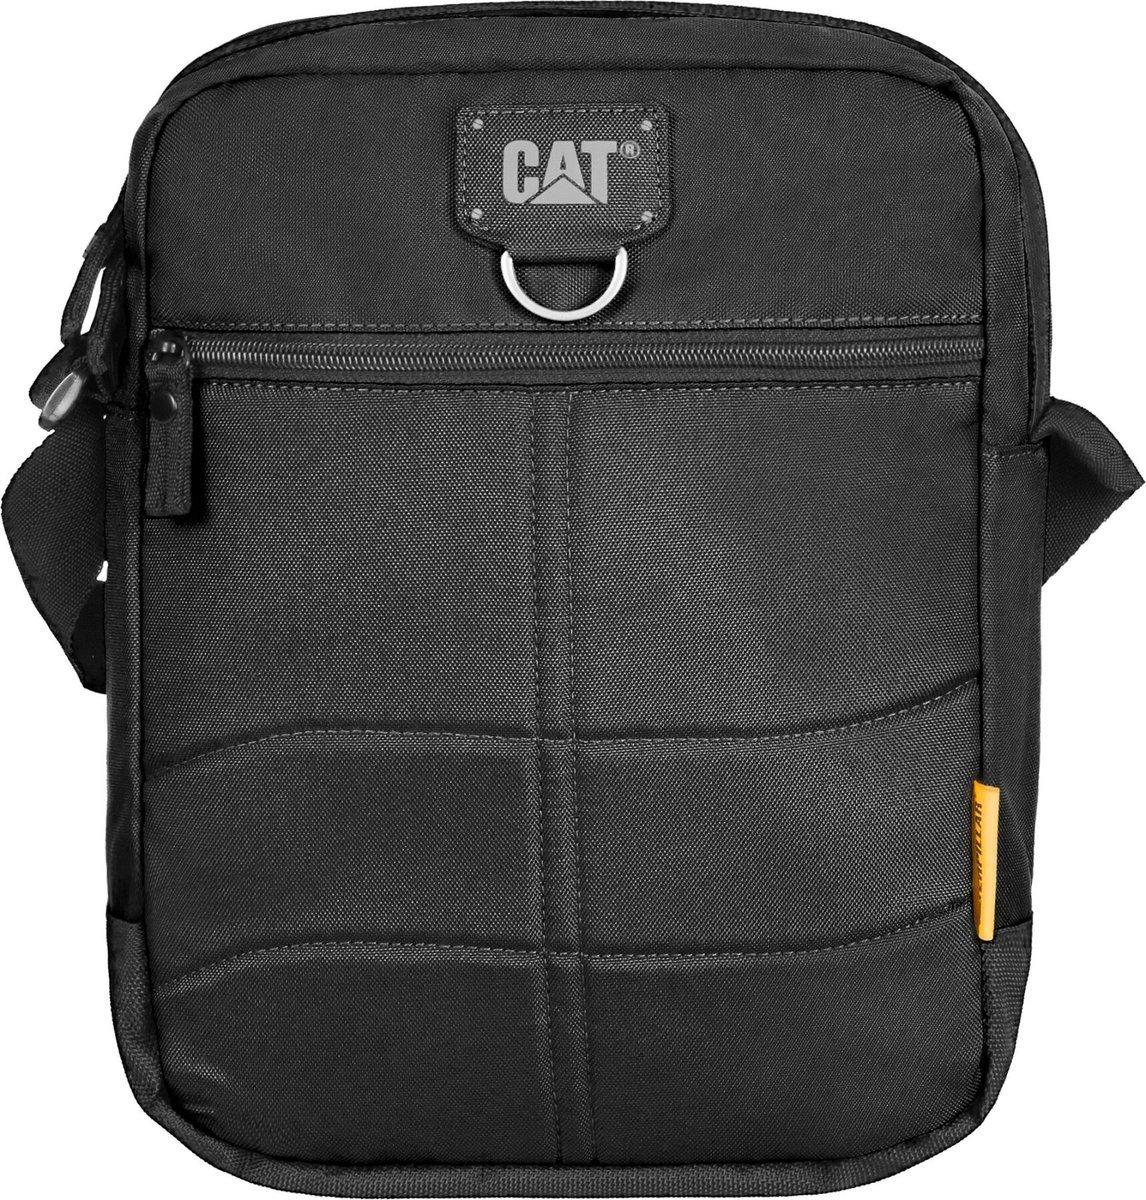 "Torba Ryan na tablet do 10"" CAT Caterpillar czarny"